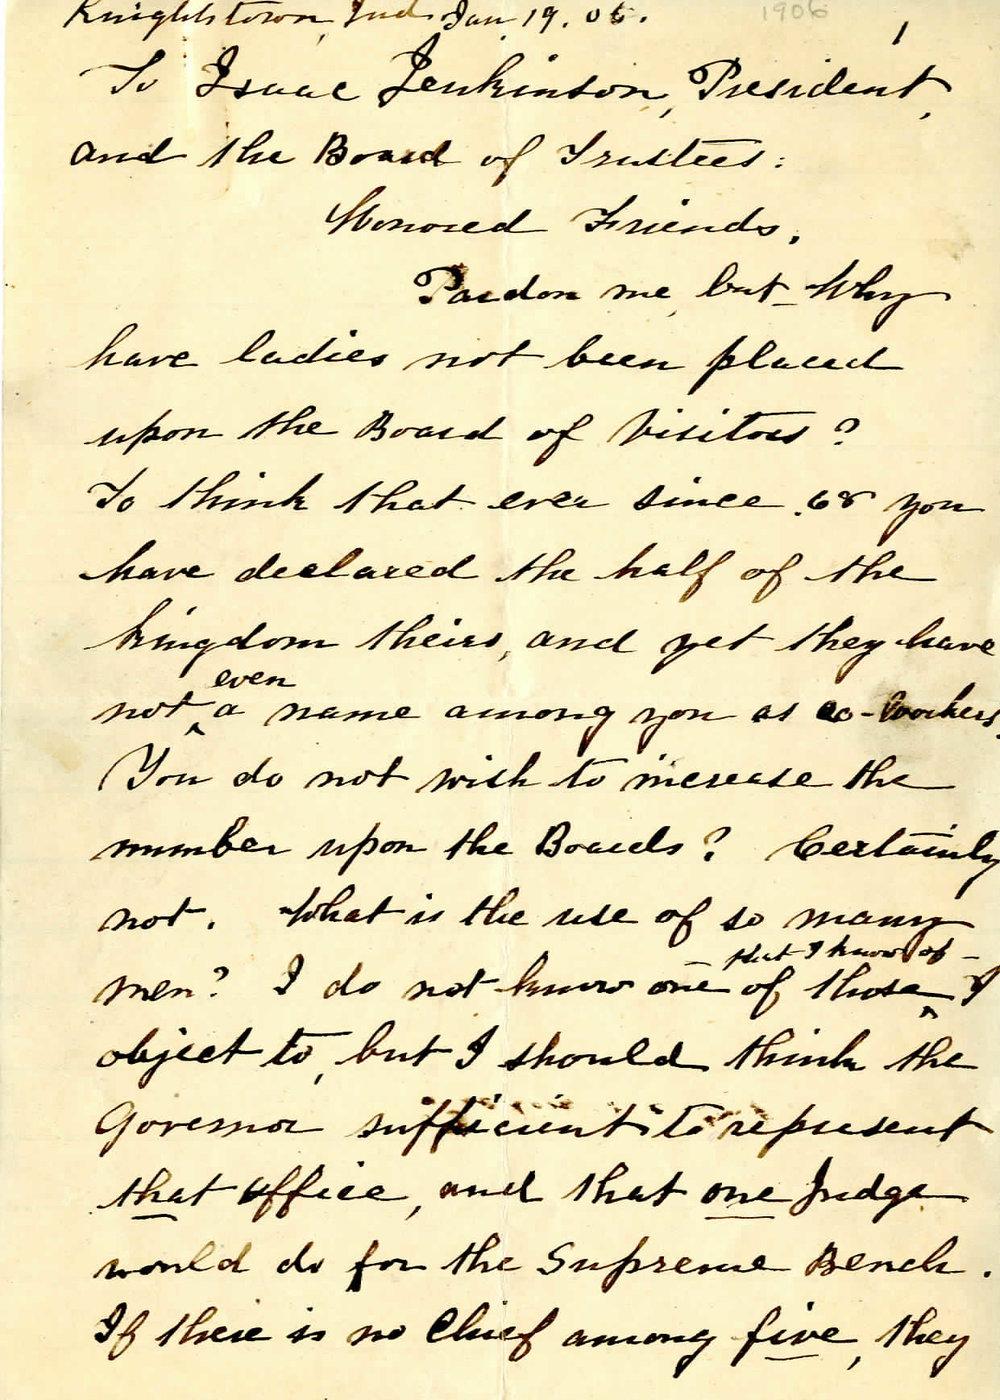 Indiana University Archives